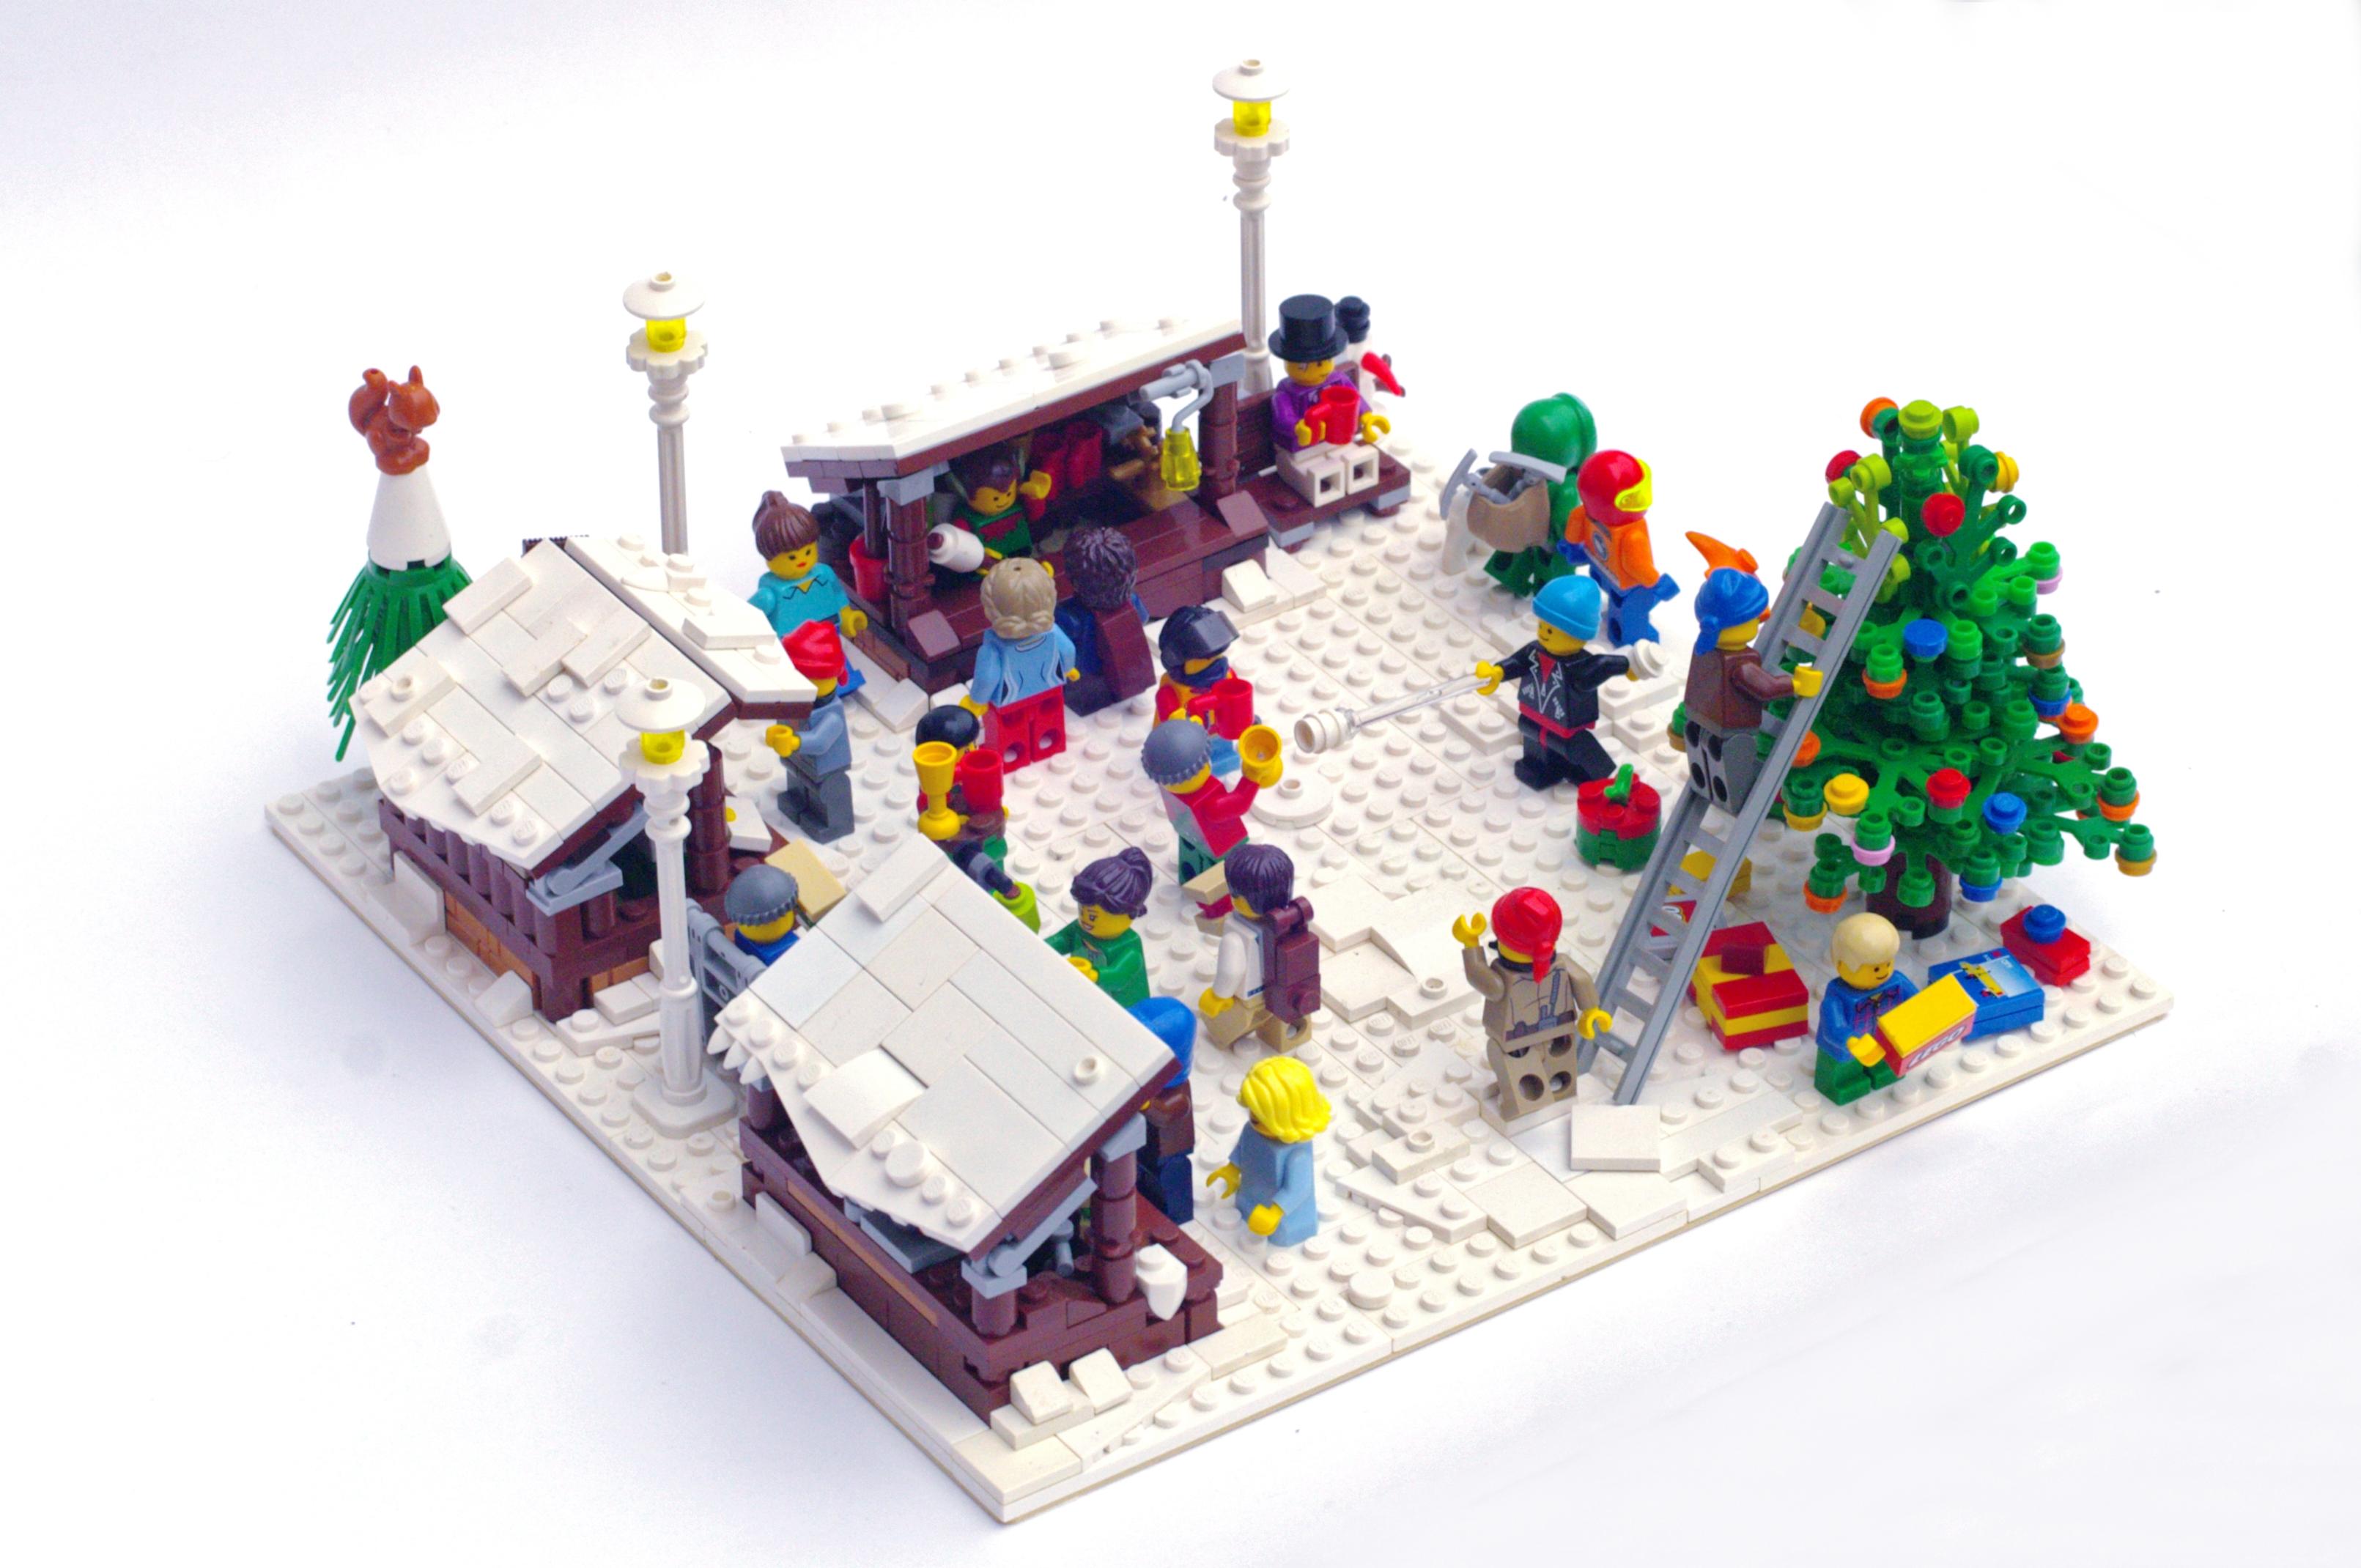 Concurs Winter Brickland – Creatia 7: Christmas Fair